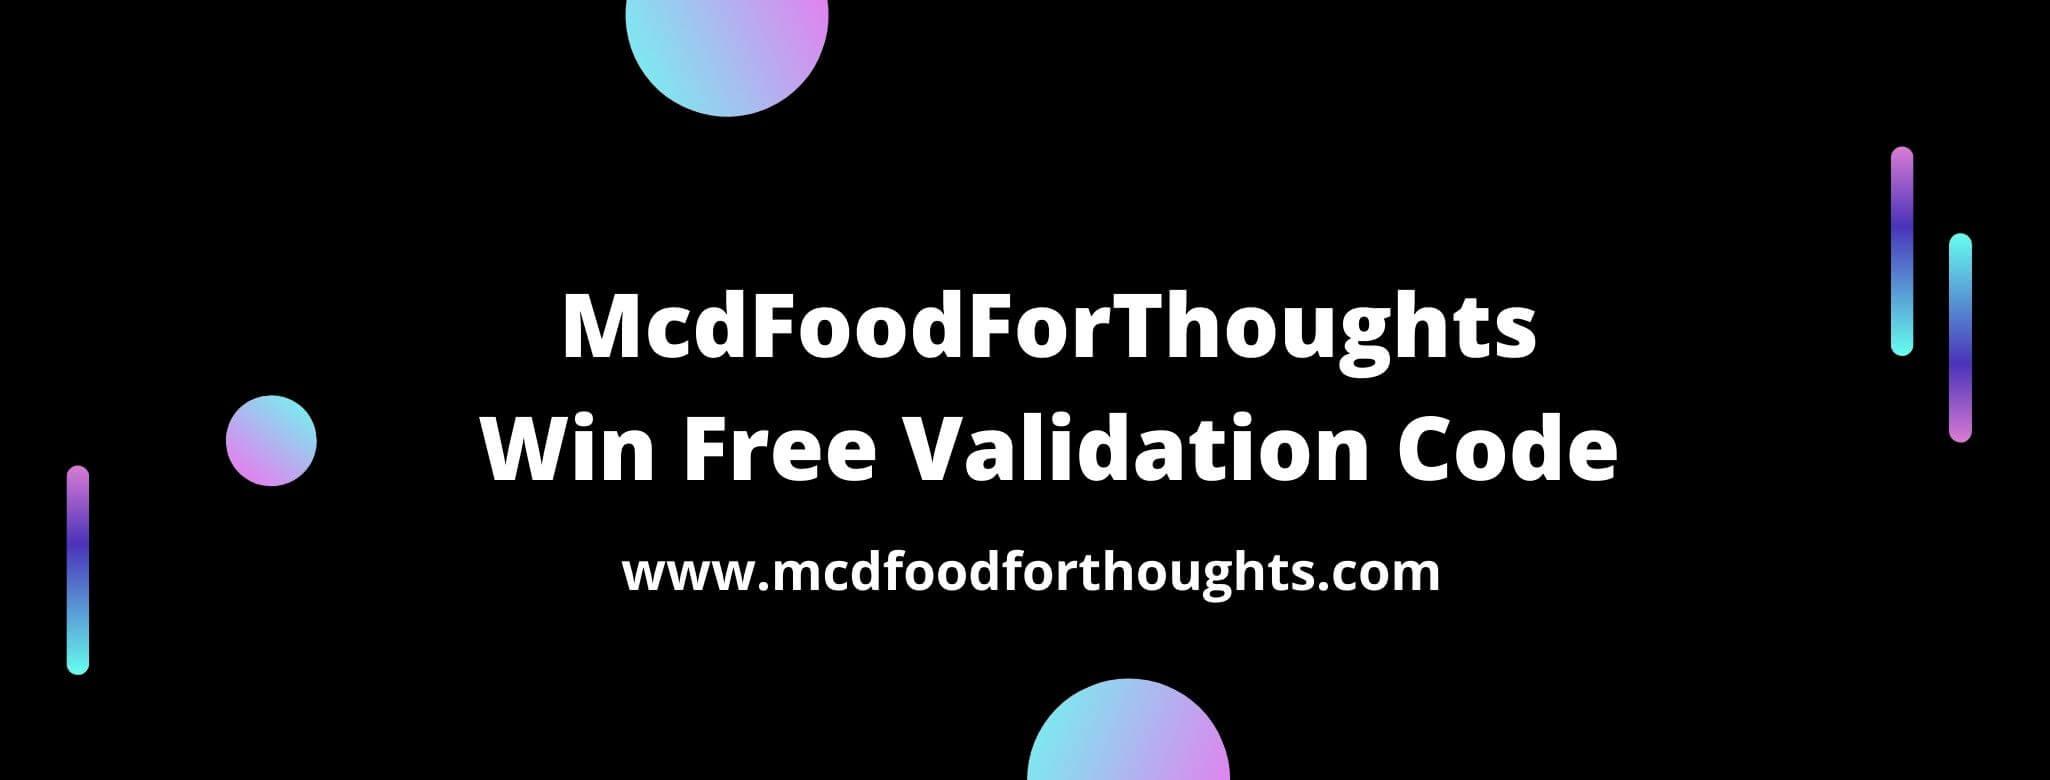 mcdonald online survey